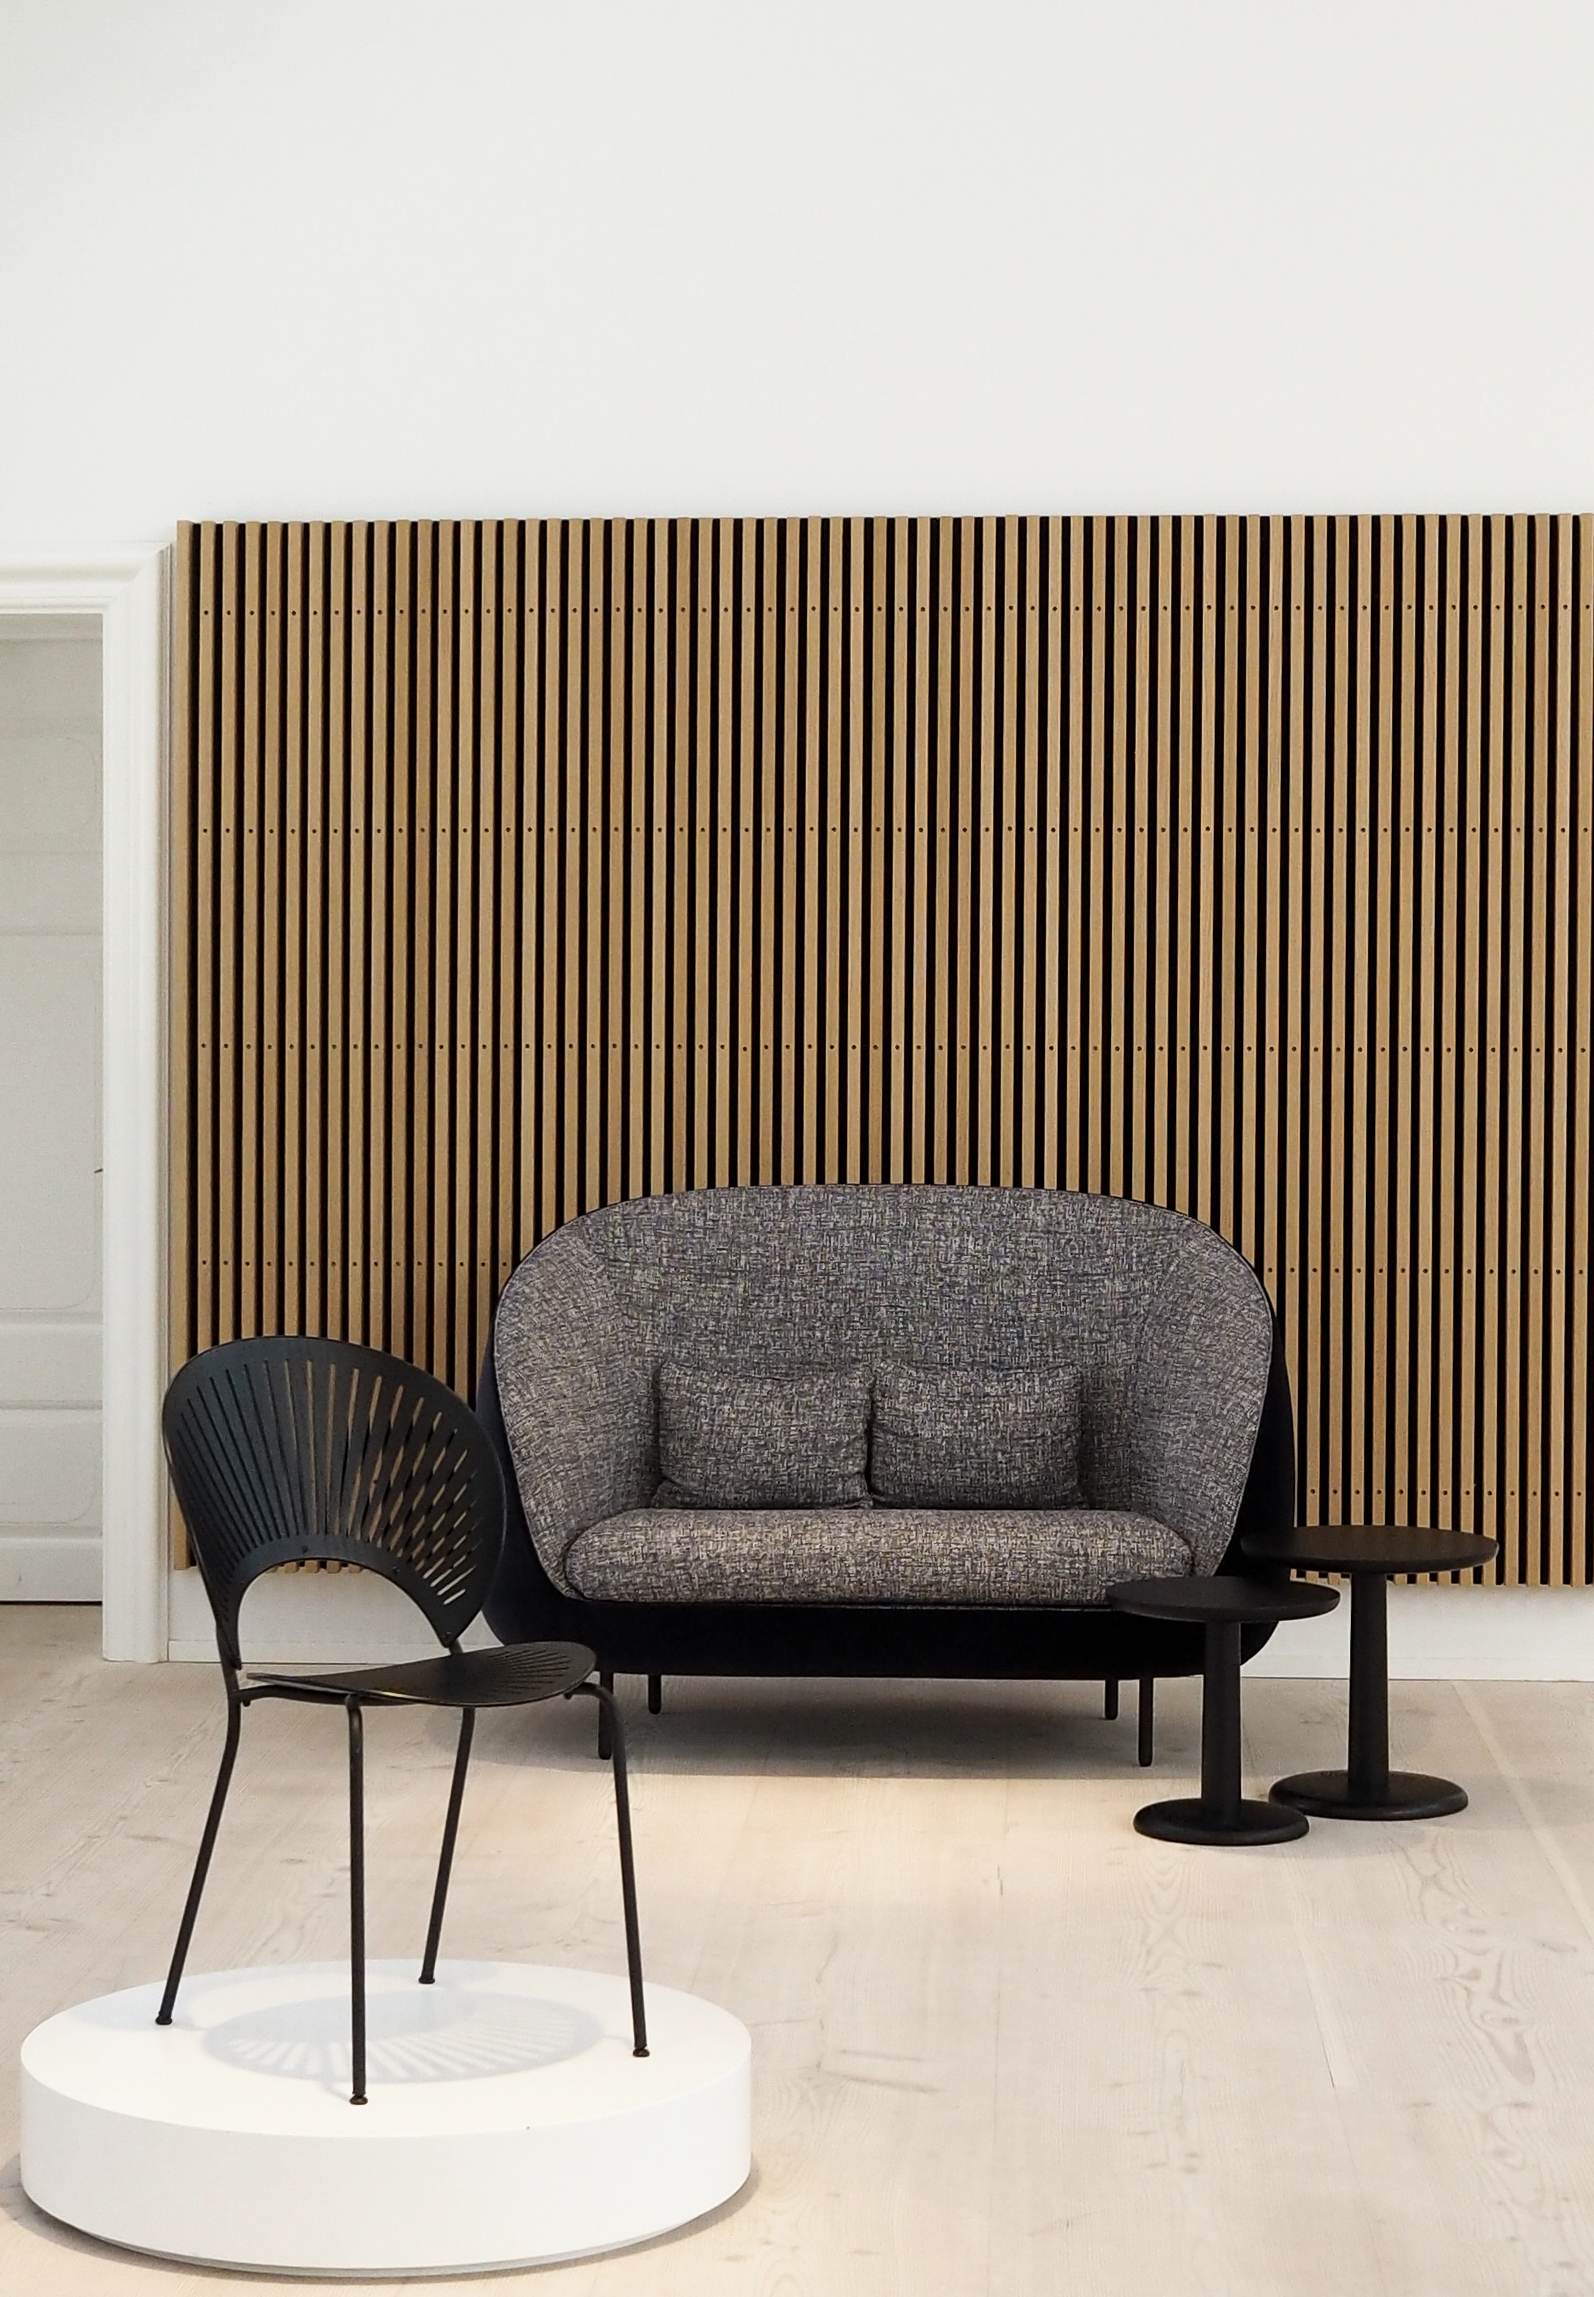 Danish Modern Furniture Design for Fredericia